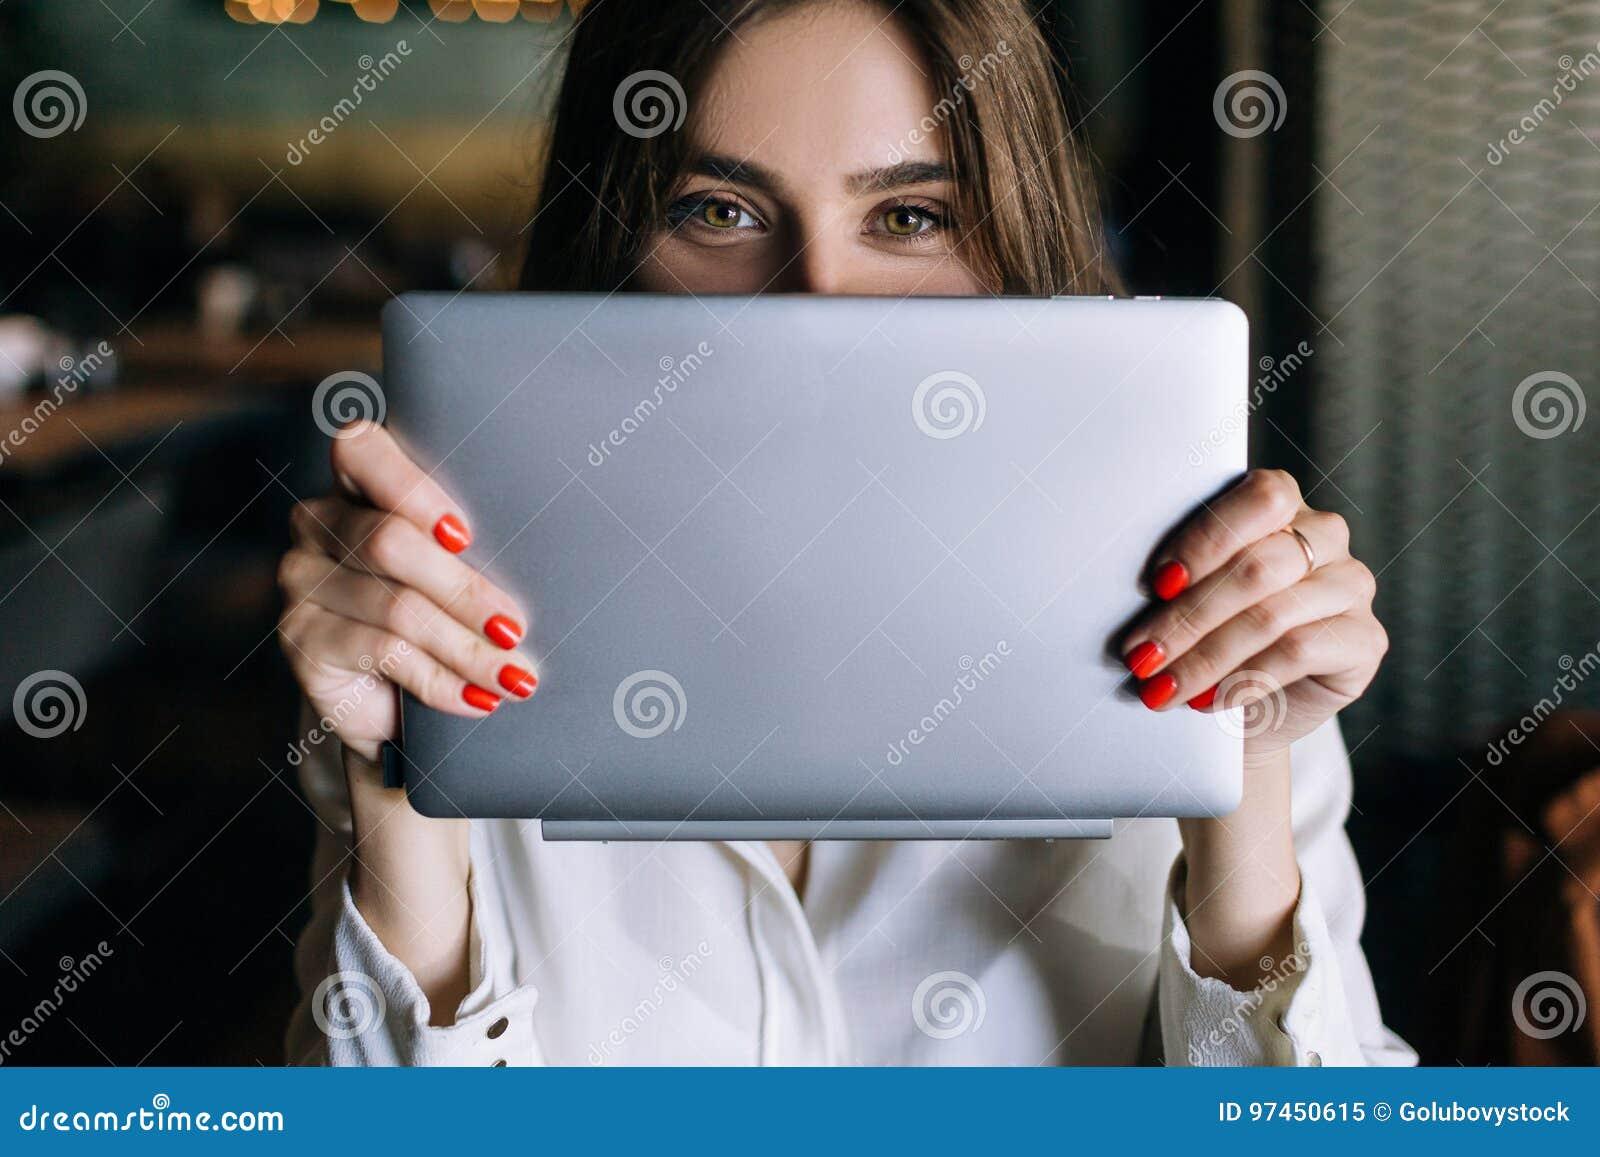 New electronic purchase. Modern technology